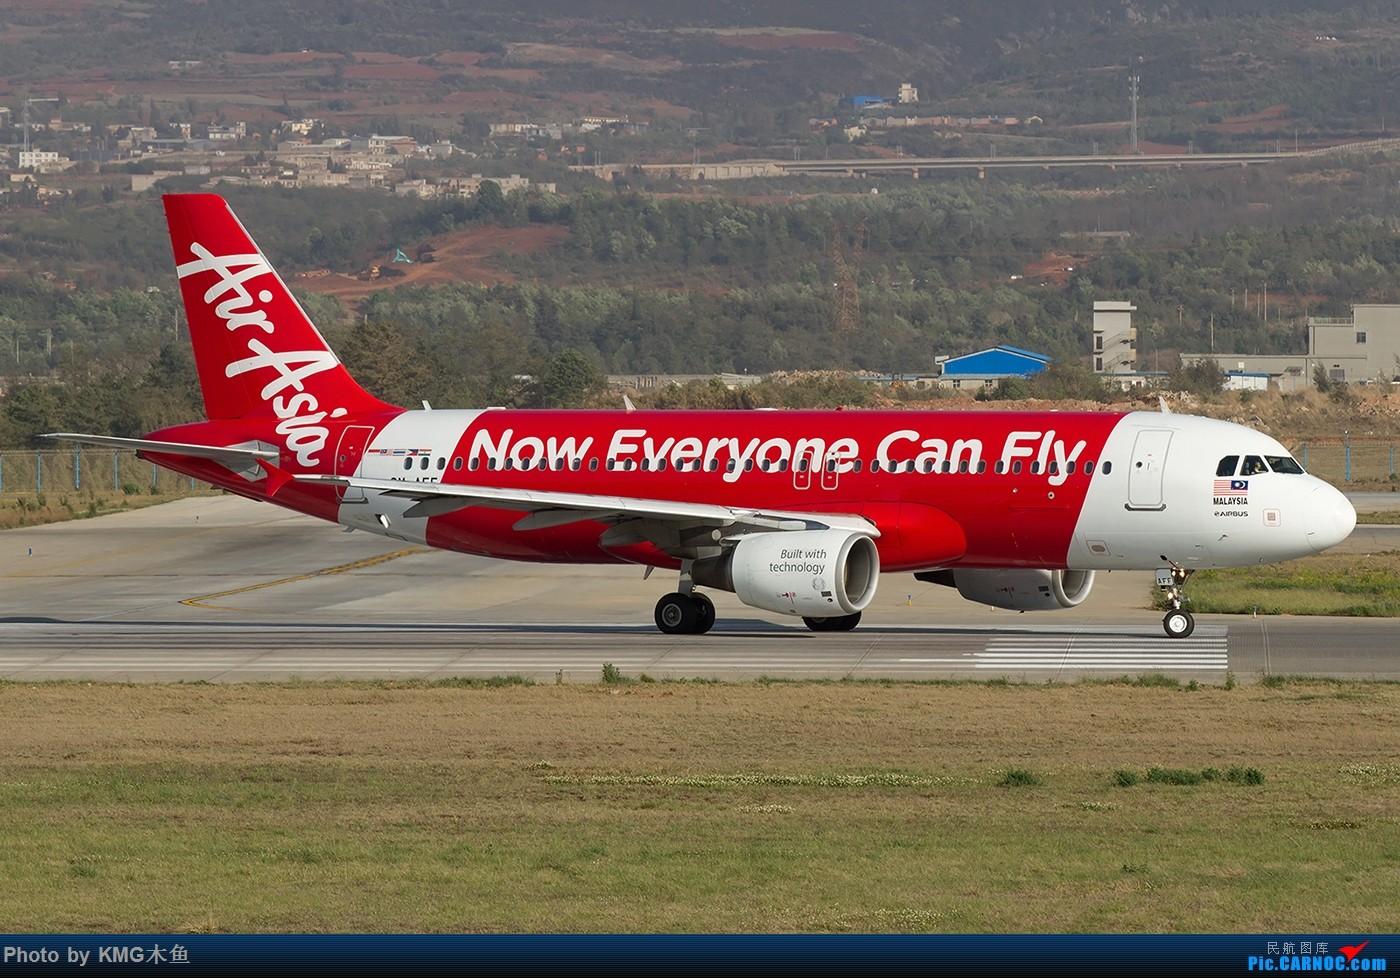 Re:[原创]【2017昆明长水国际机场——KMG木鱼拍机】今年第二次发帖,老样子,老机型,老位置,老图新发 AIRBUS A320-200 9M-AFF 中国昆明长水国际机场